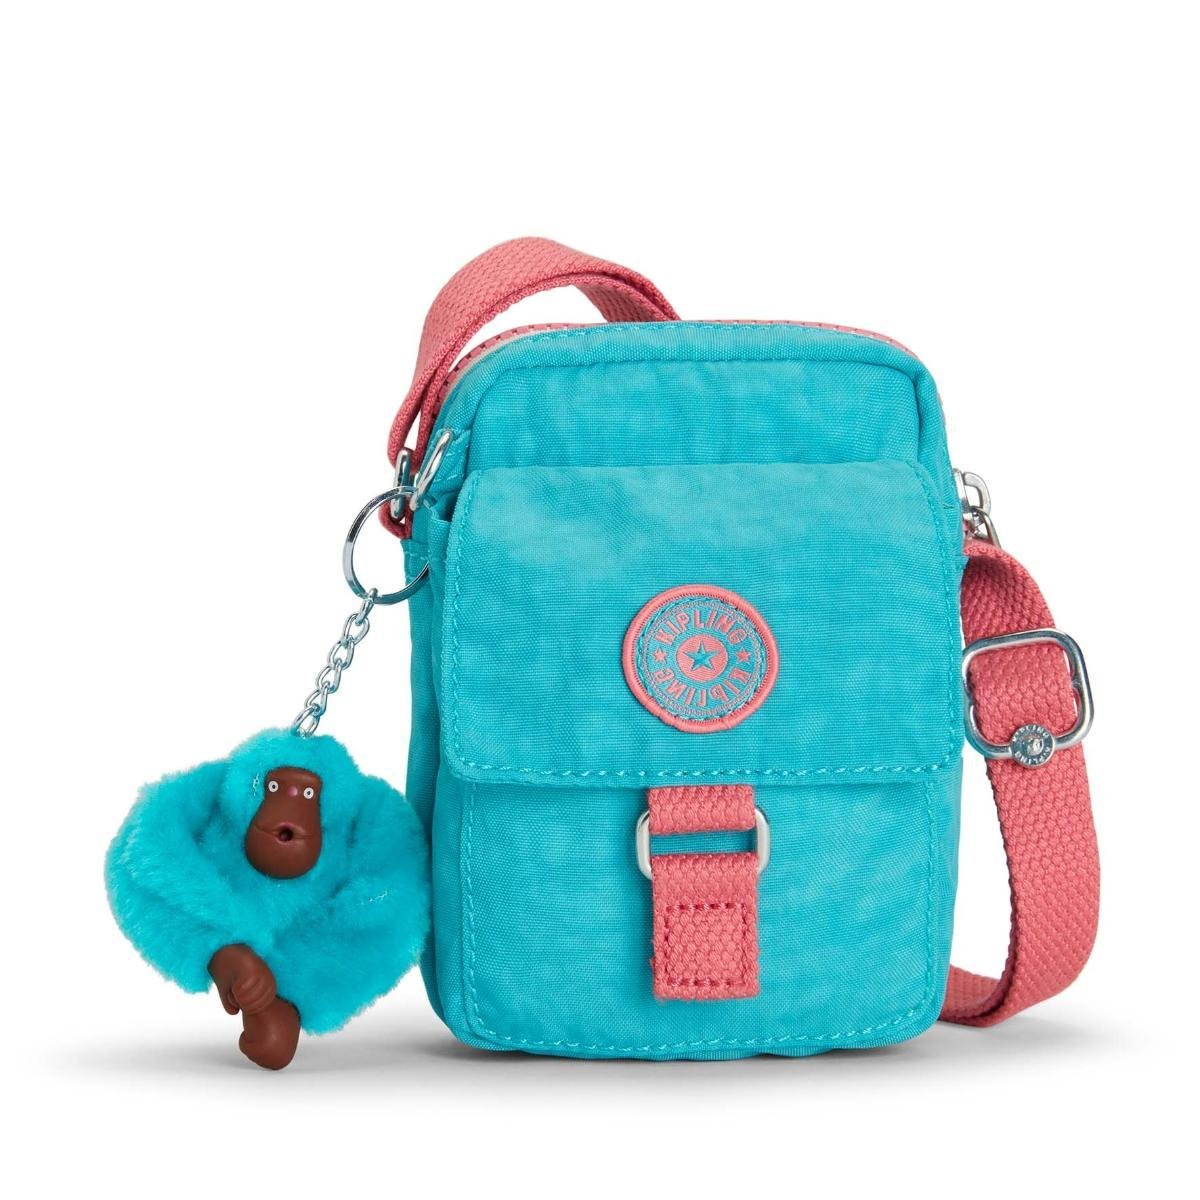 a4db3ba22 Kipling Mini Bolsa Teddy Feminina - Azul Turquesa | Menor preço com ...